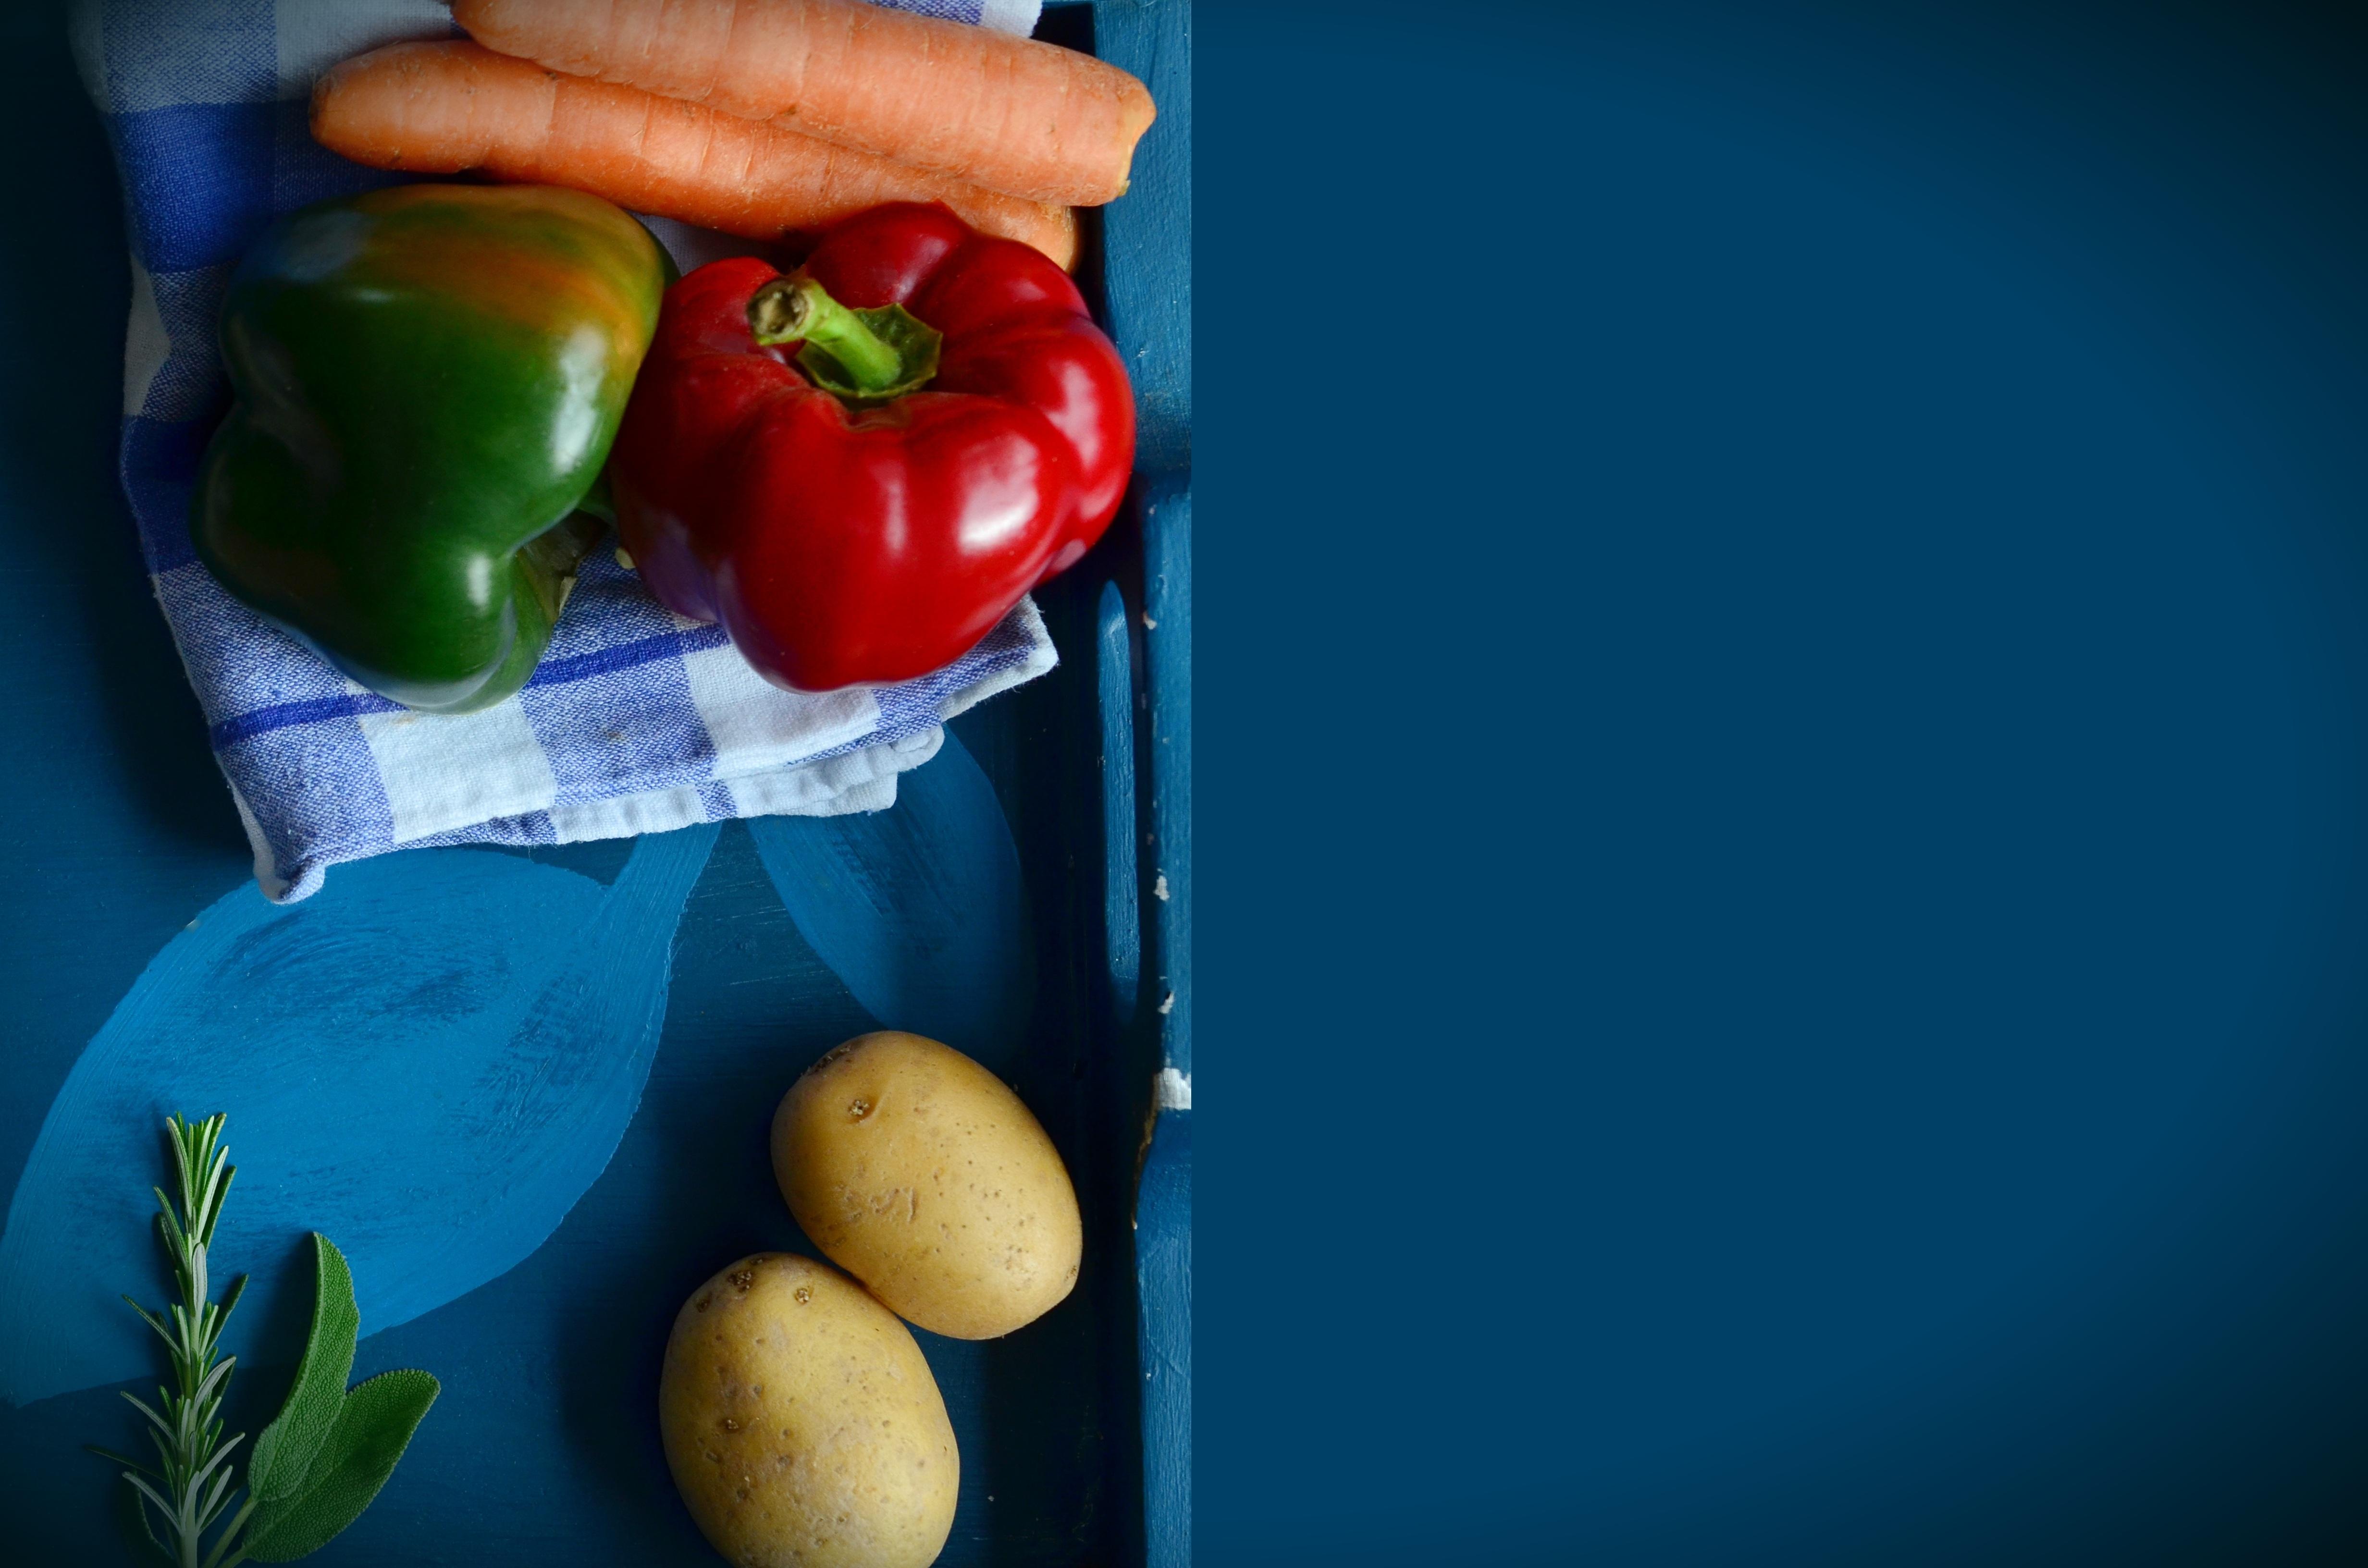 free images   fruit  food  produce  vegetable  recipe  still life  preparation  cook  background